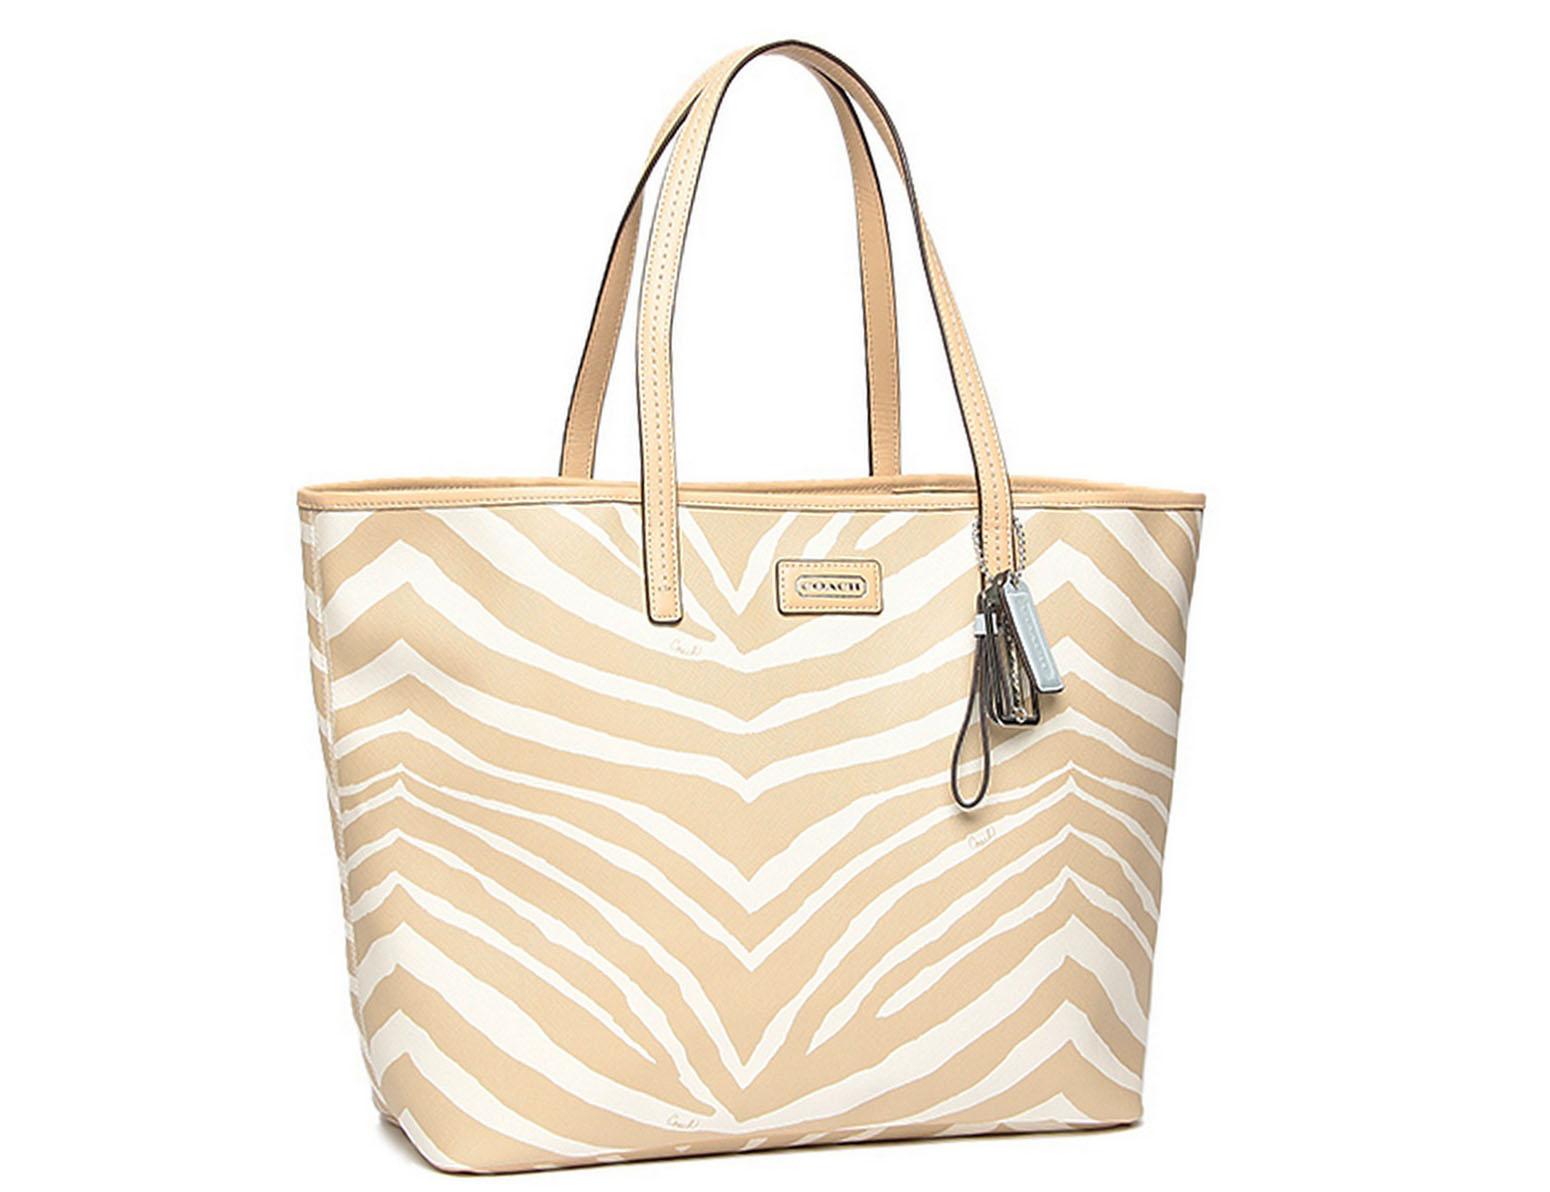 【COACH】COACH 斑馬紋單肩大型包 米白色